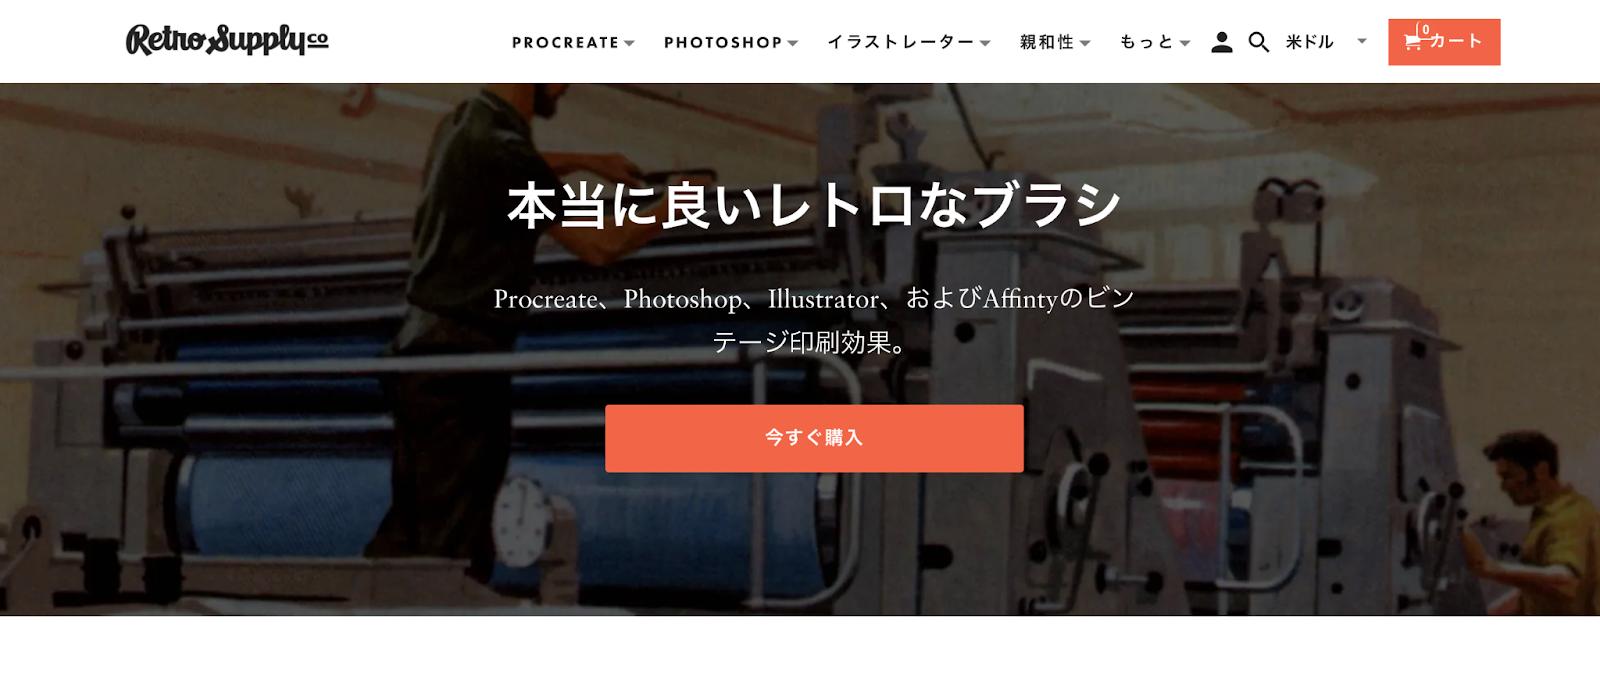 shopify デジタルコンテンツ 成功事例 RetroSupply Co。